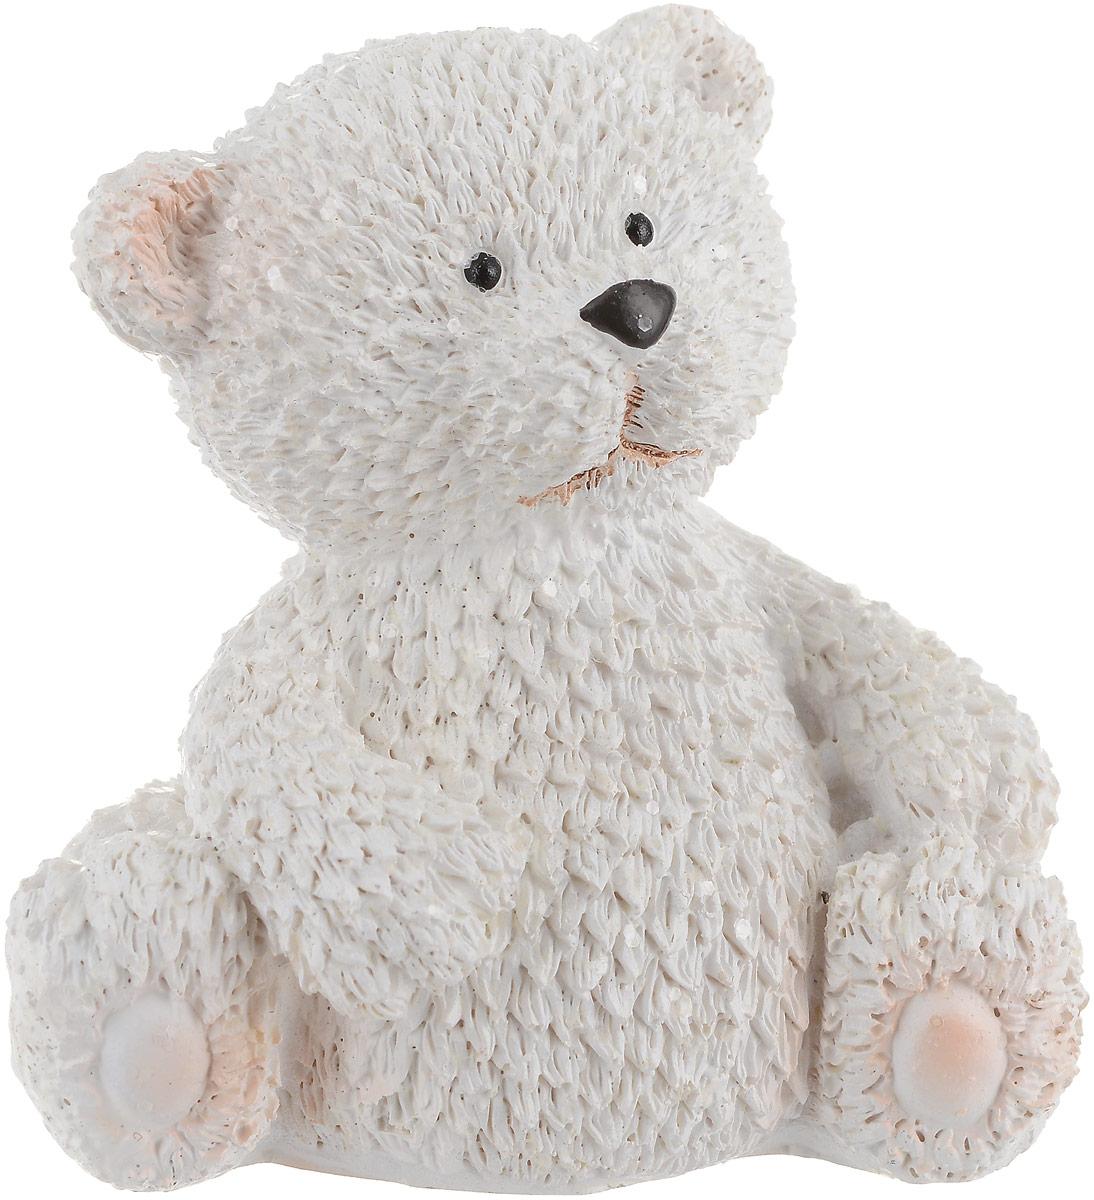 Фигурка декоративная Феникс-Презент Снежный мишка, высота 7 см. 75669 ваза декоративная феникс презент высота 13 5 см 43822